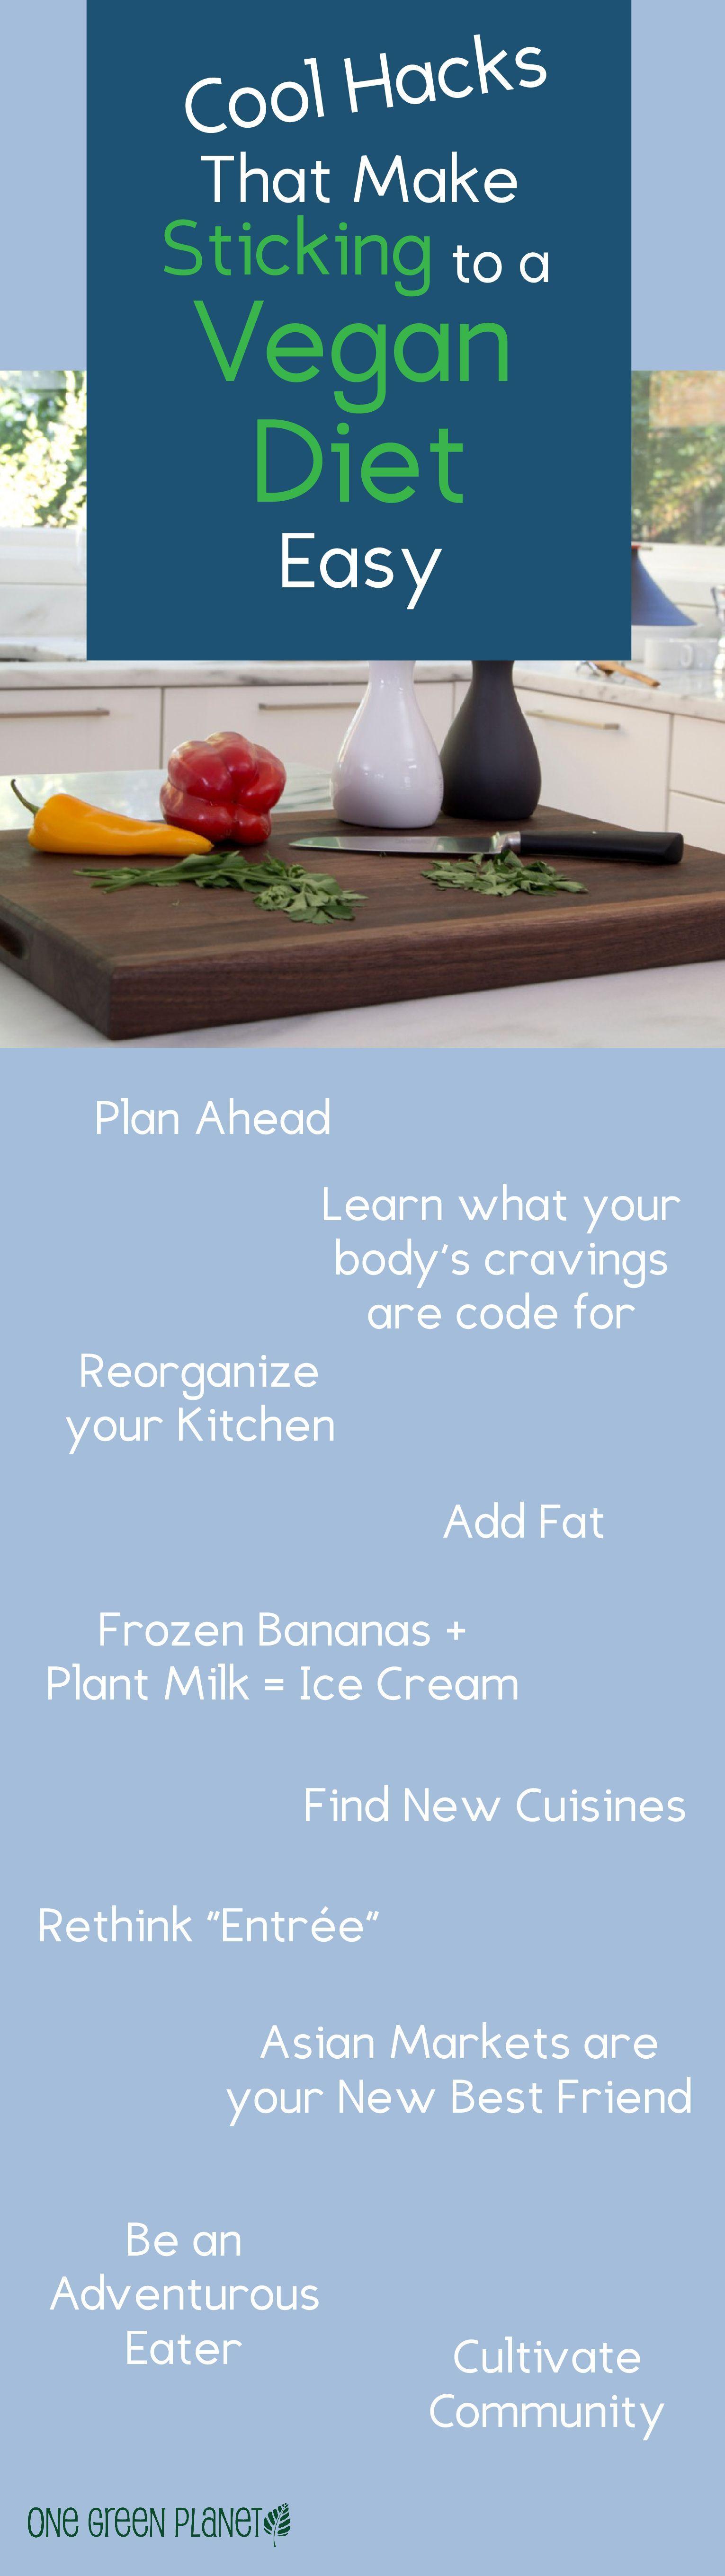 Cool Hacks That Make Sticking to a Vegan Diet Super-Easy!